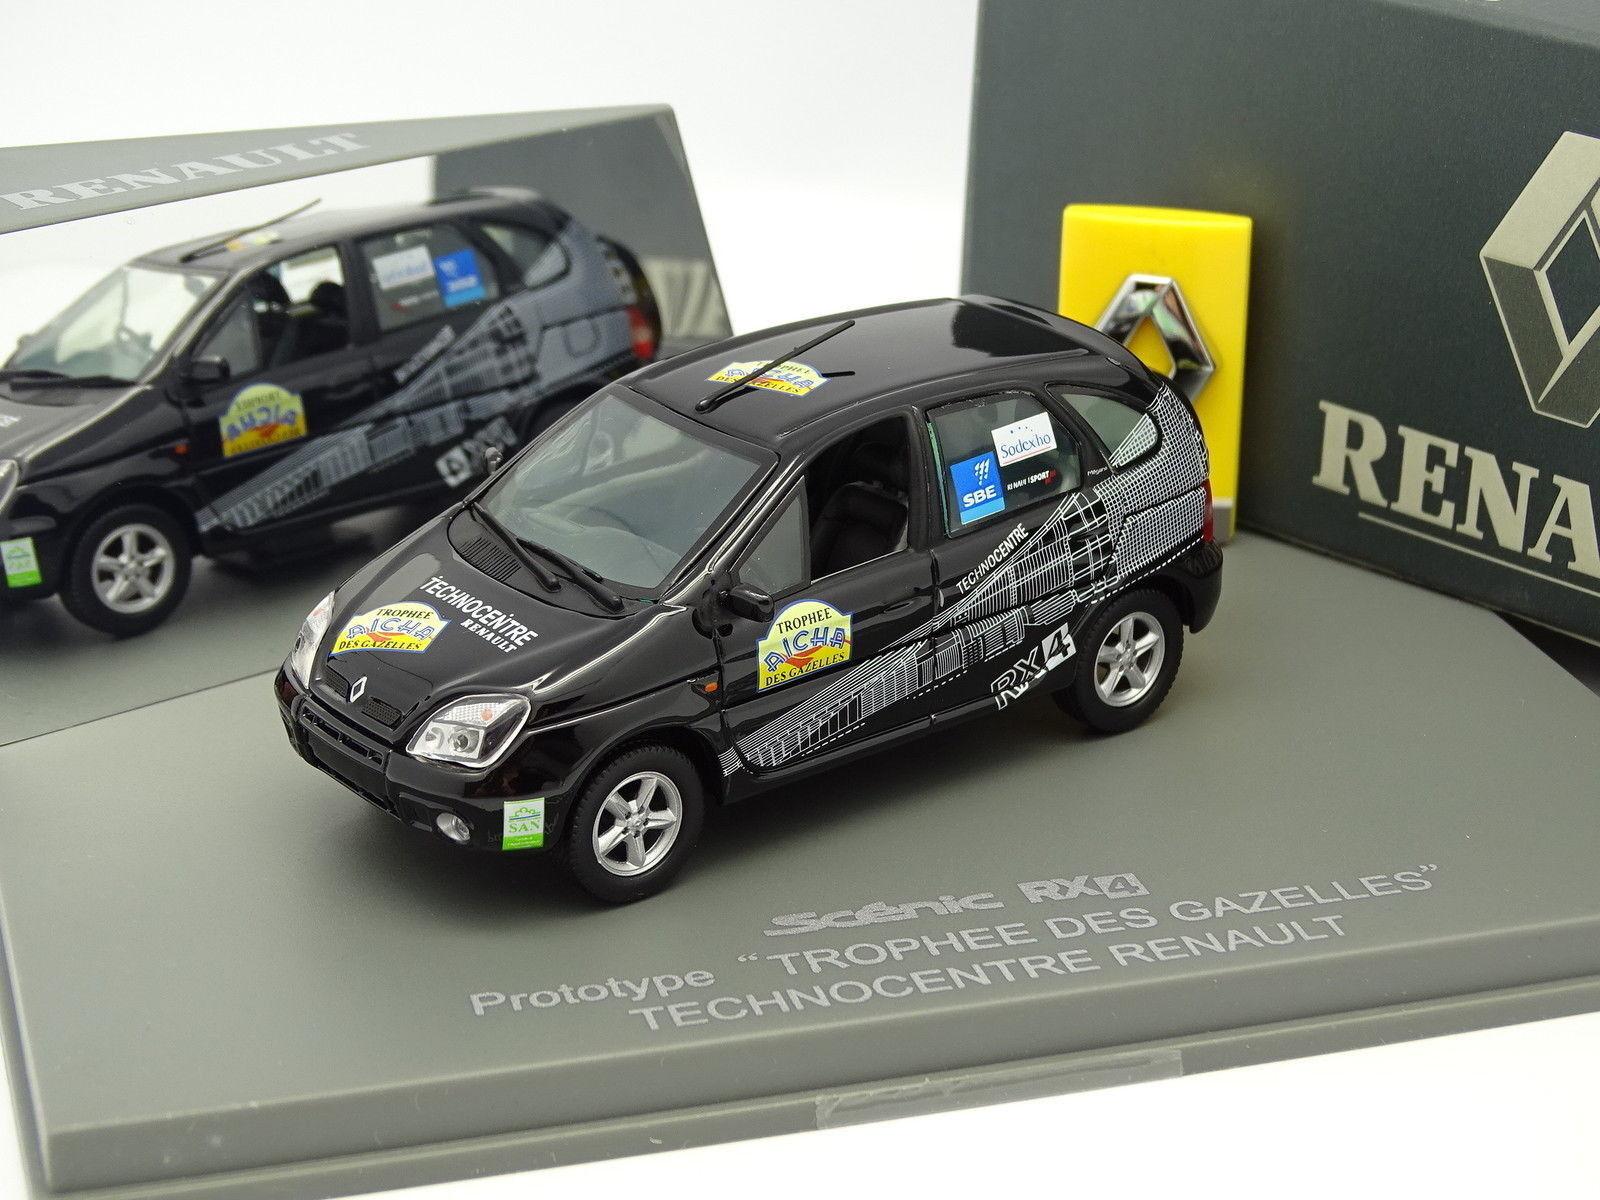 - 1   43 - renault scenic RX26760 prototipo rallye gazzelle technocentre schwarz